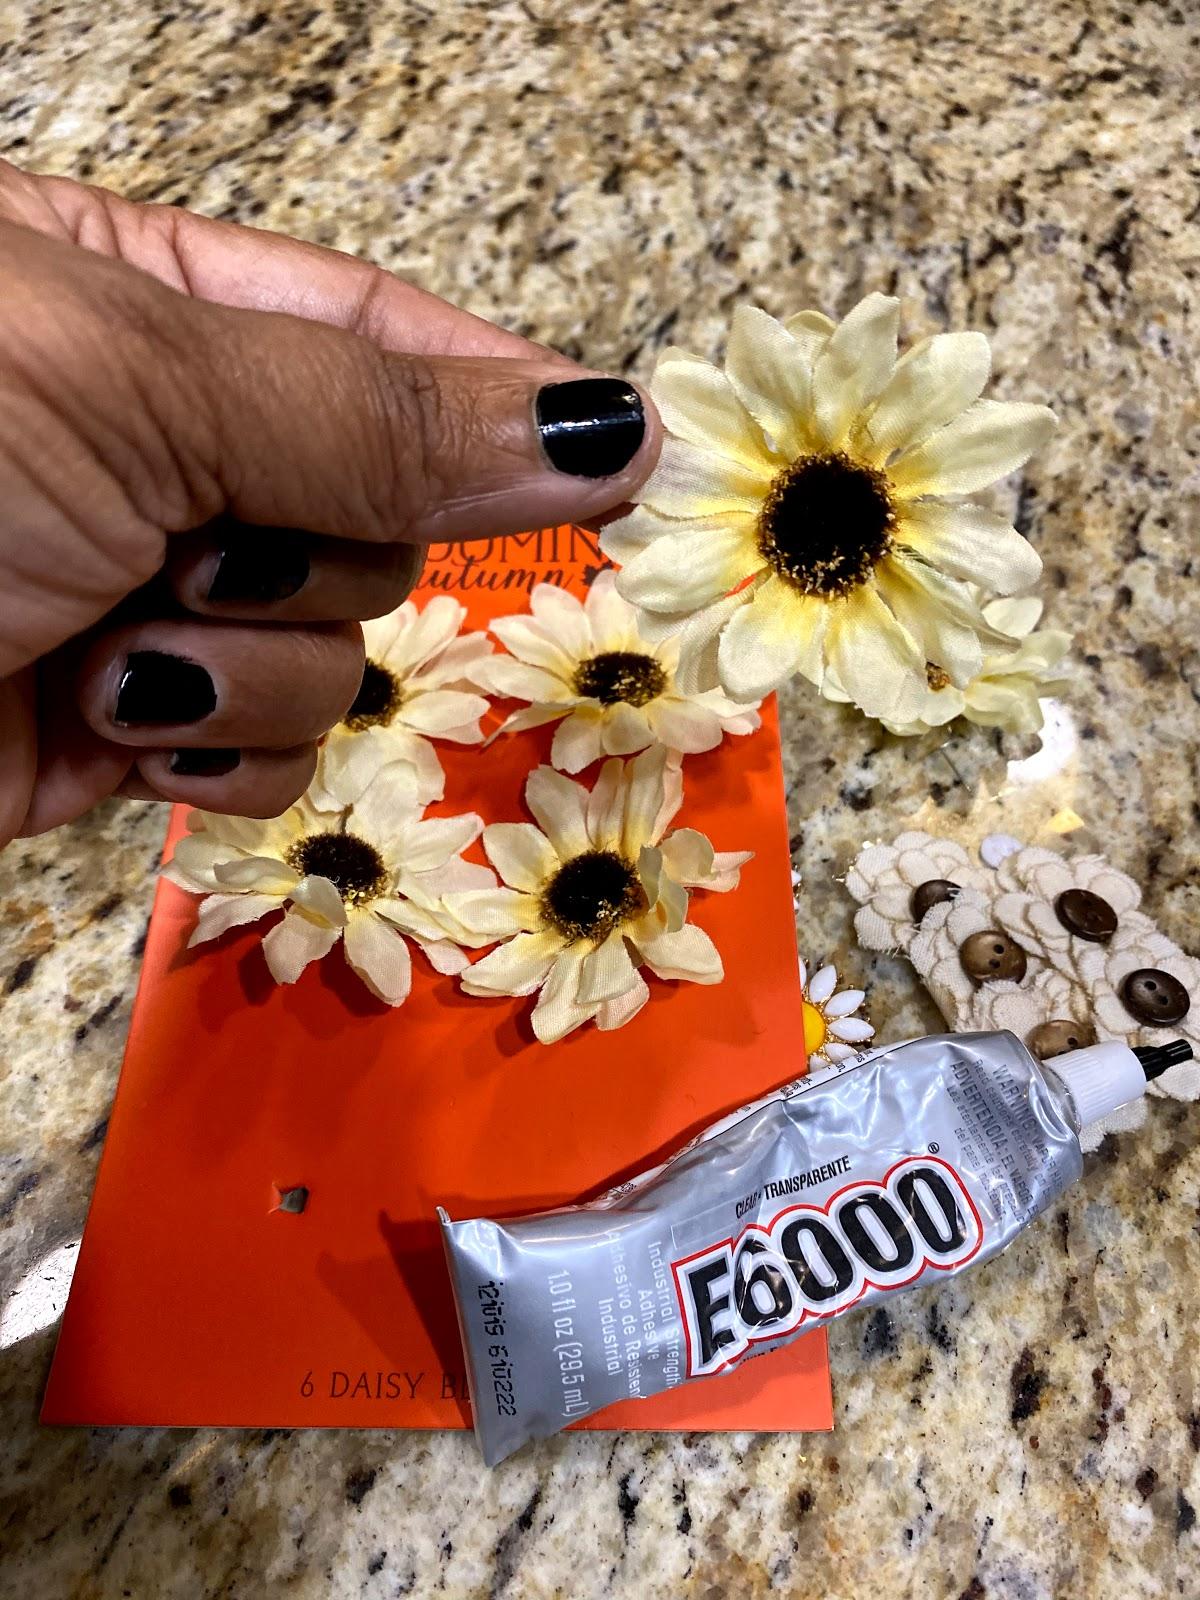 Making earrings at home using E-6000 glue